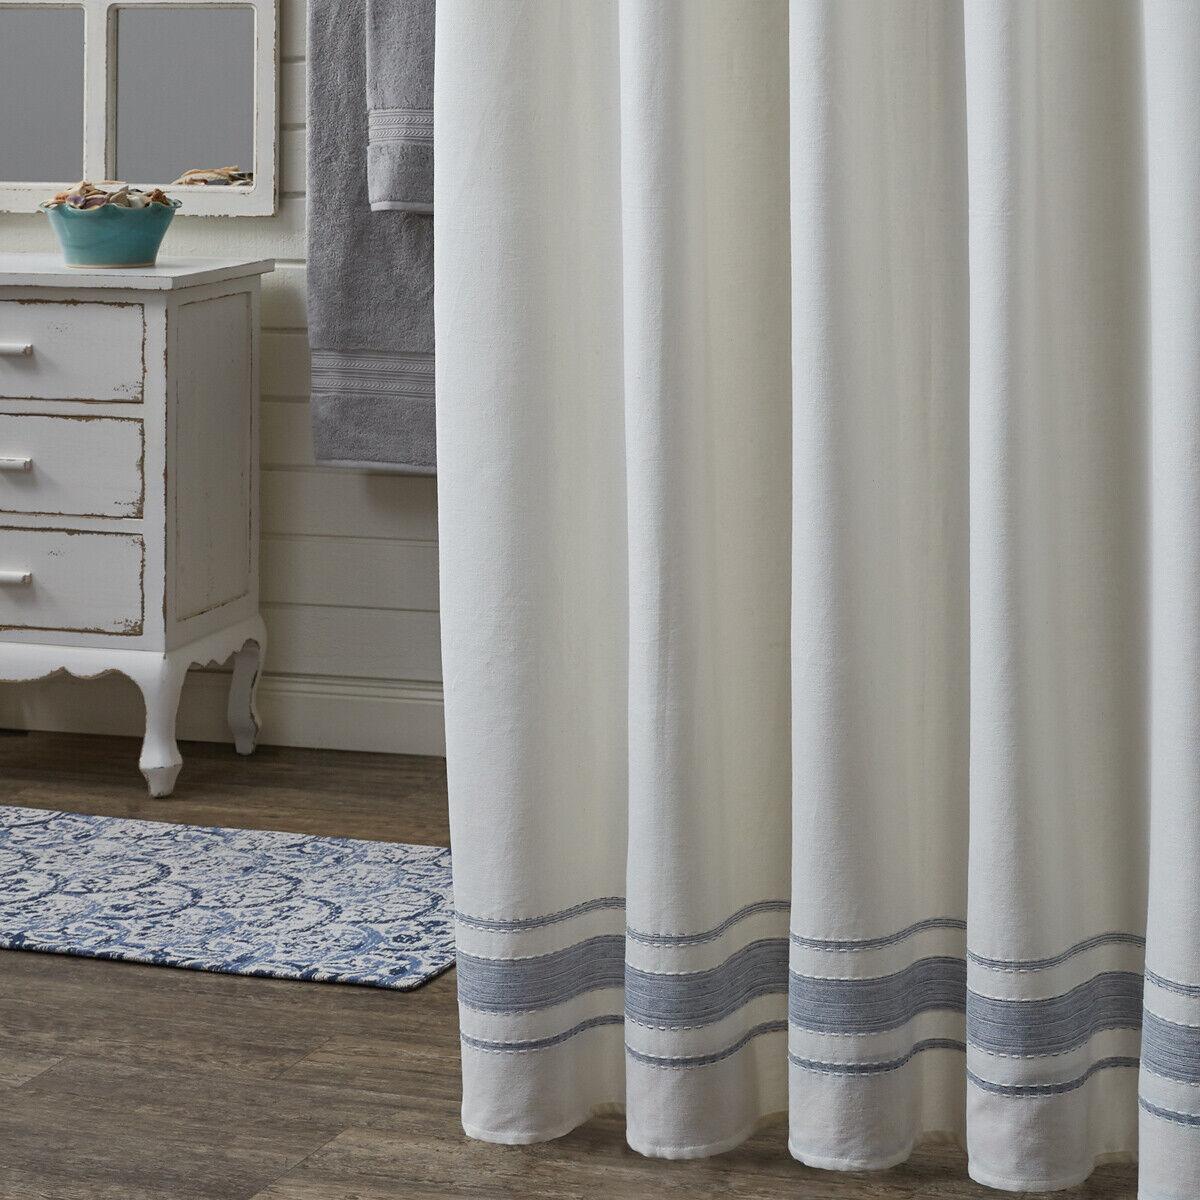 Park Design Ruffled Shower Curtain 72 x 72 Inches White Formal  Bathroom